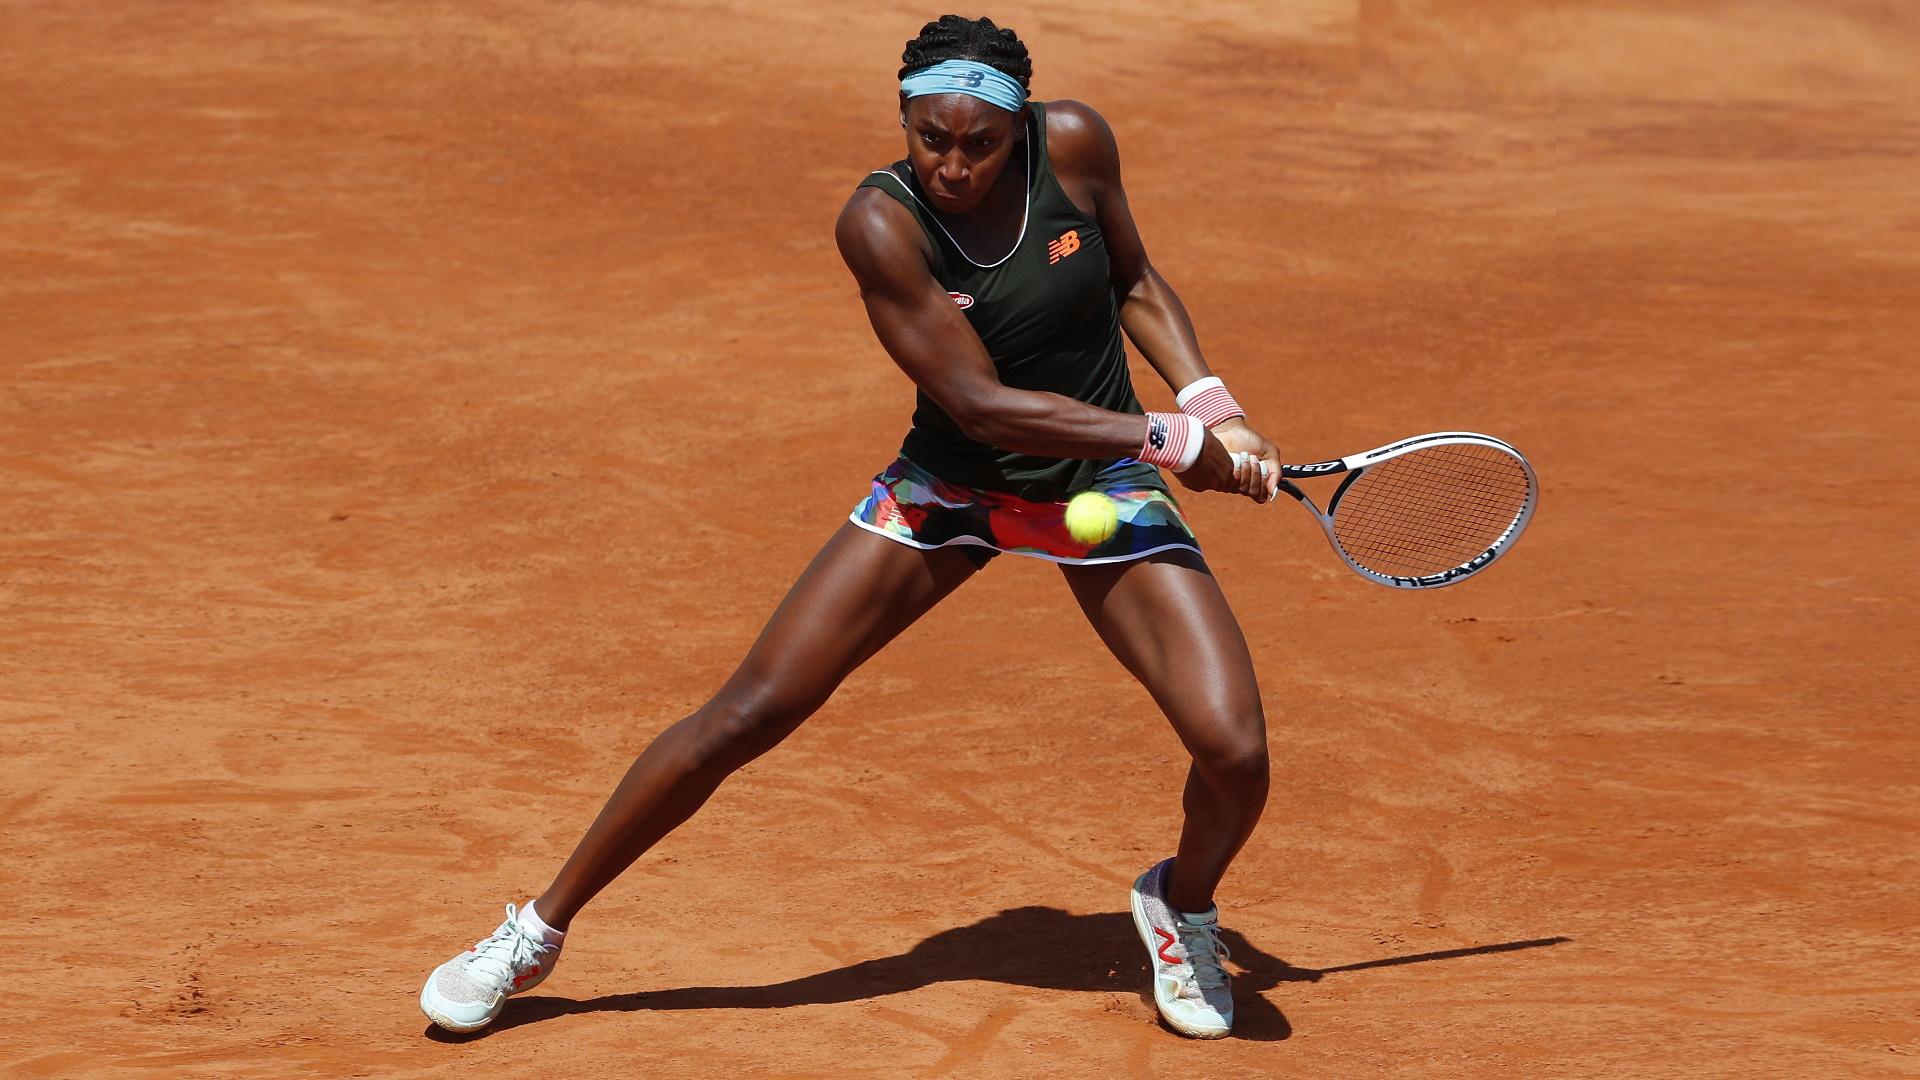 WTA 1000 Torneo Roma: Cori Gauff - Aryna Sabalenka